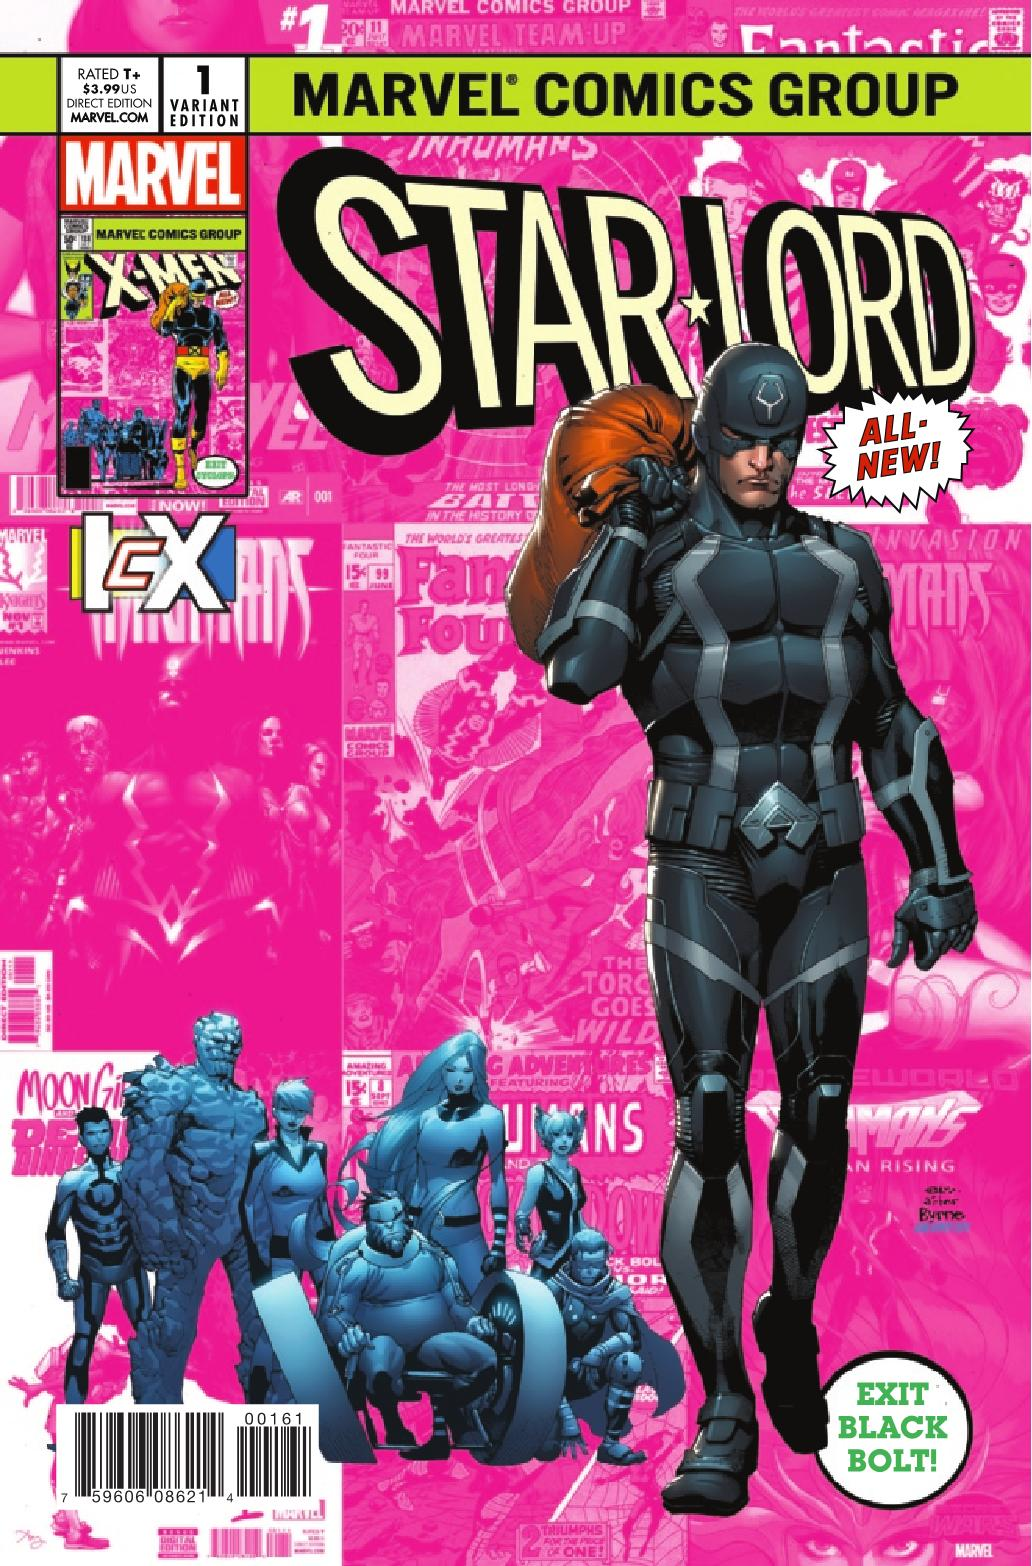 STARLORD2016001_DC61_LR_1